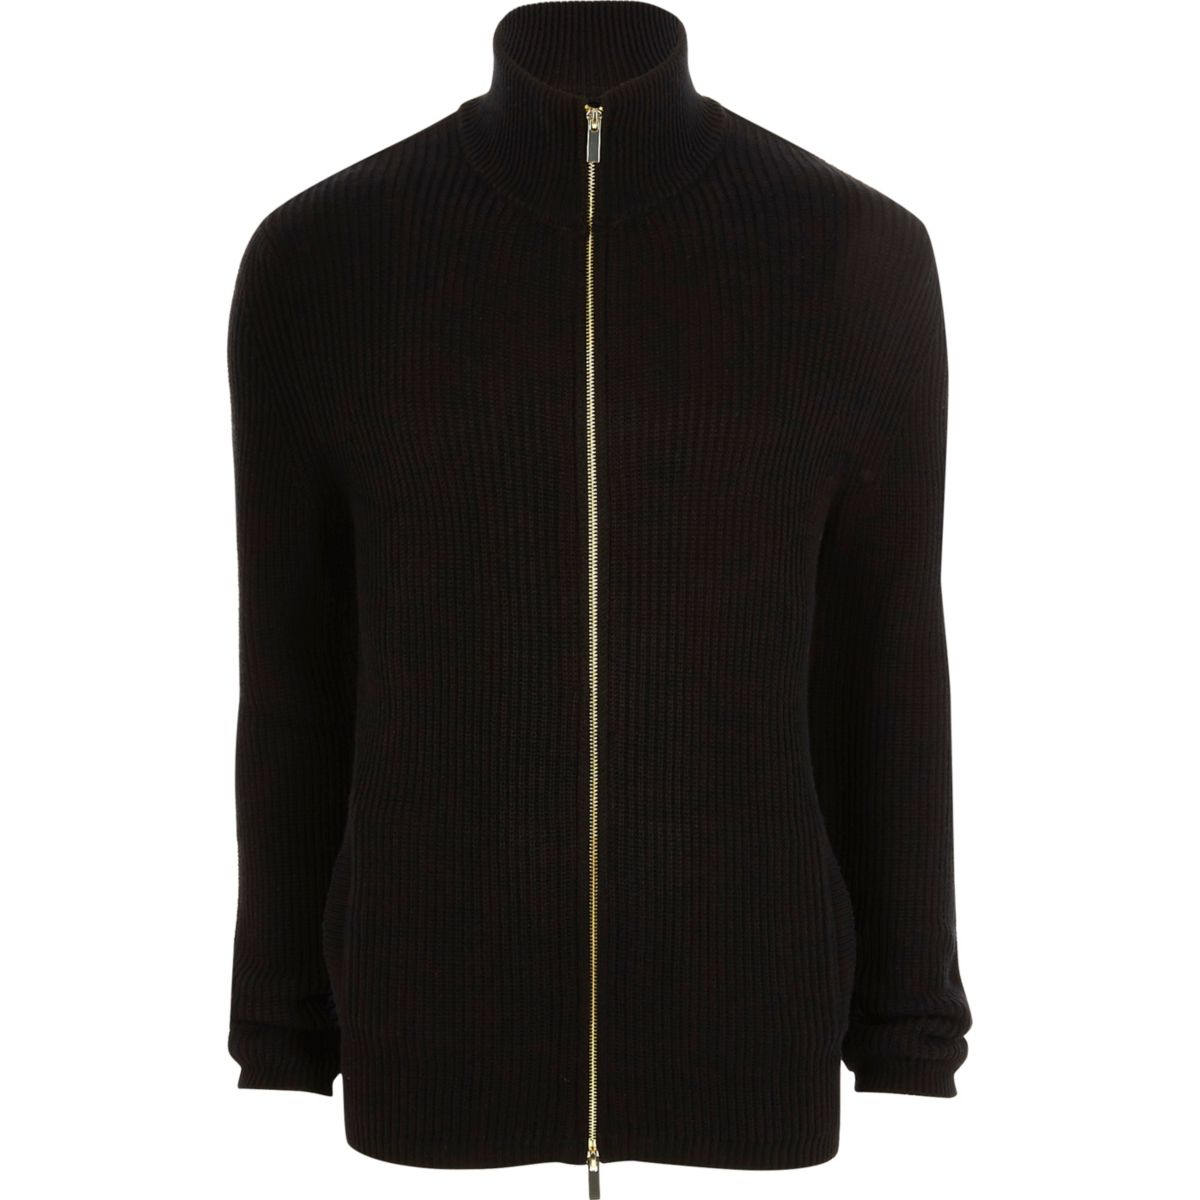 Black rib knit funnel neck zip front cardigan